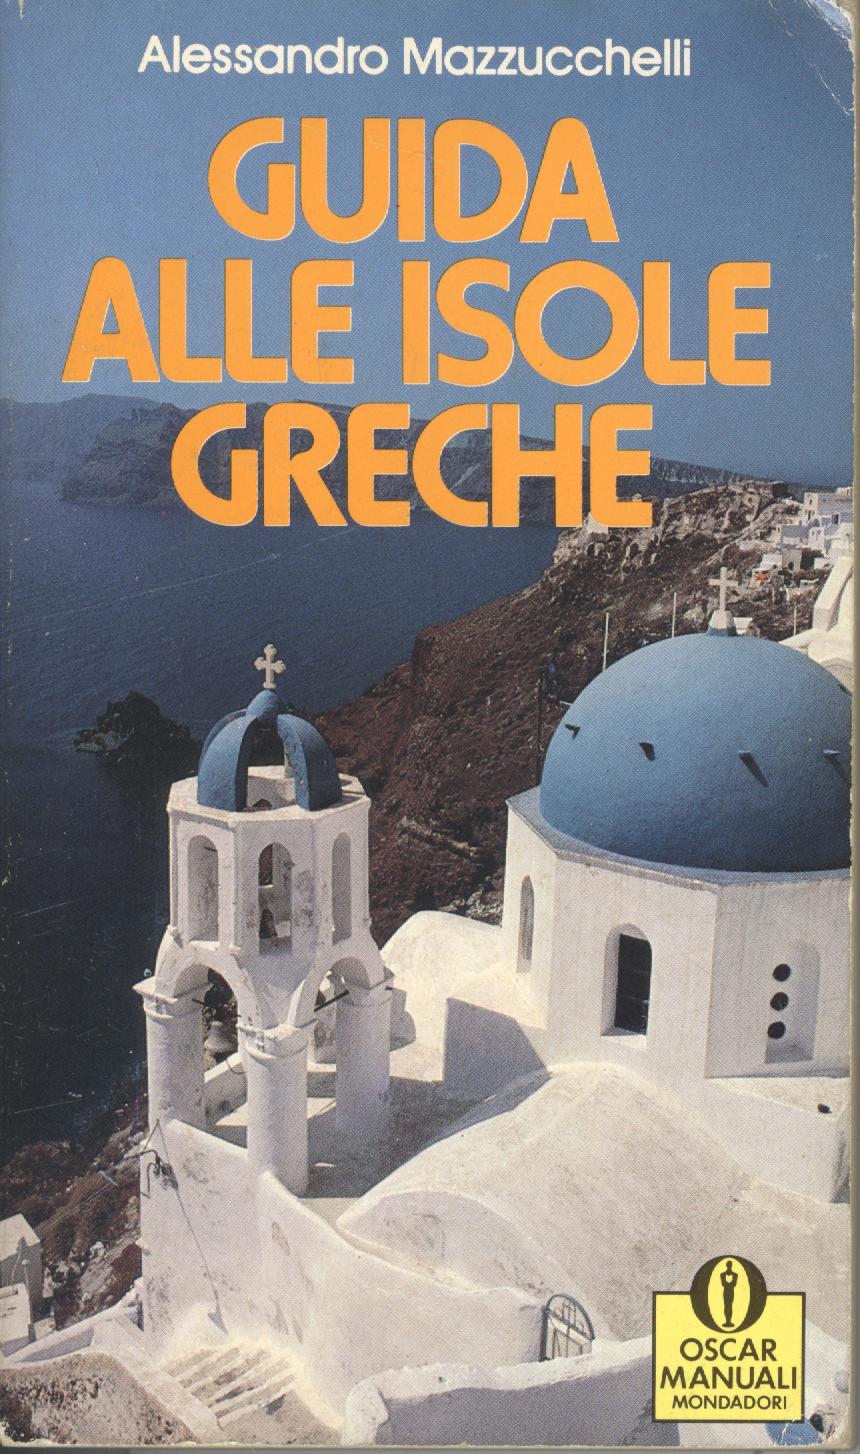 Guida alle isole greche